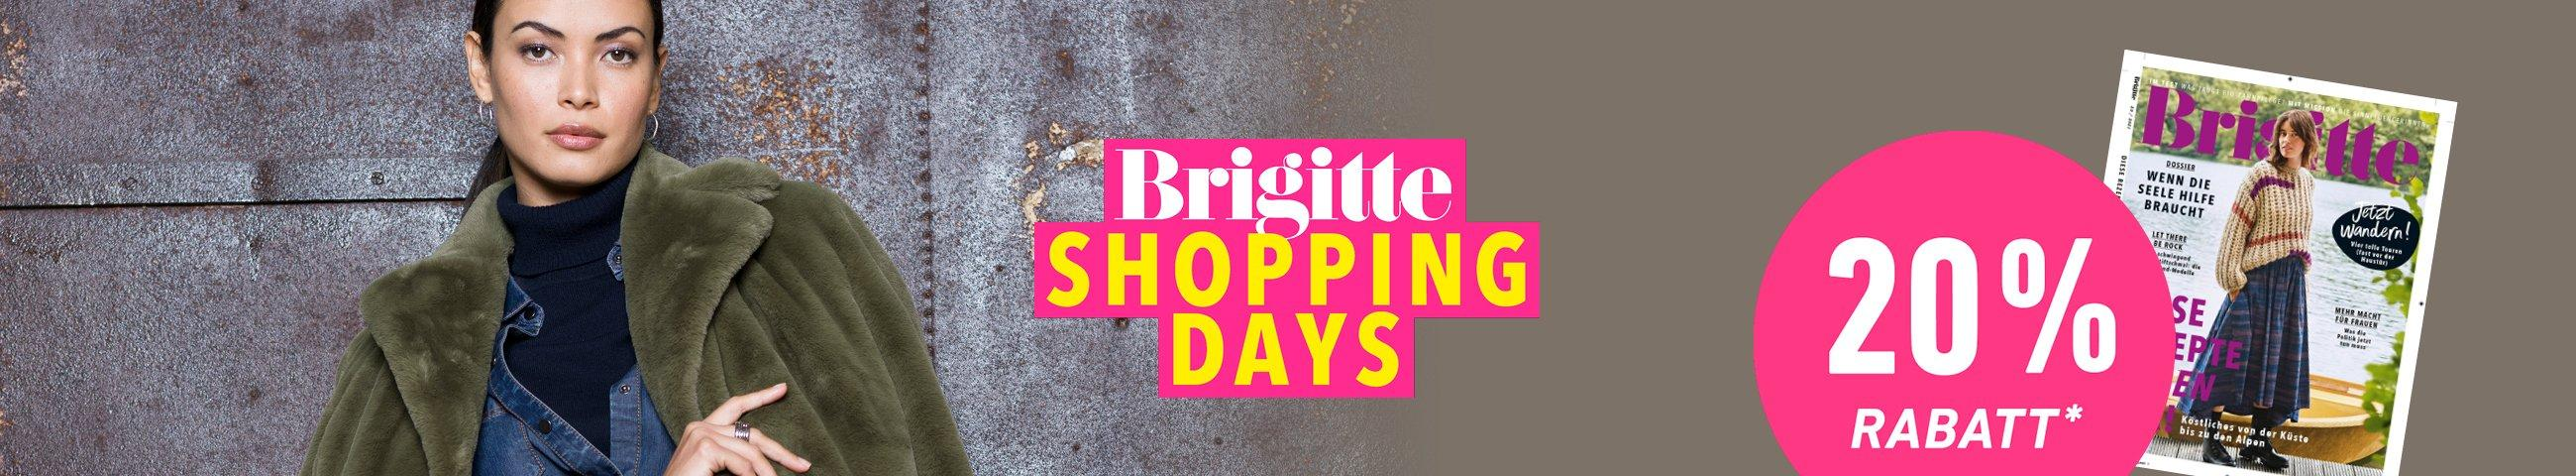 Brigitte Shopping Days 2021